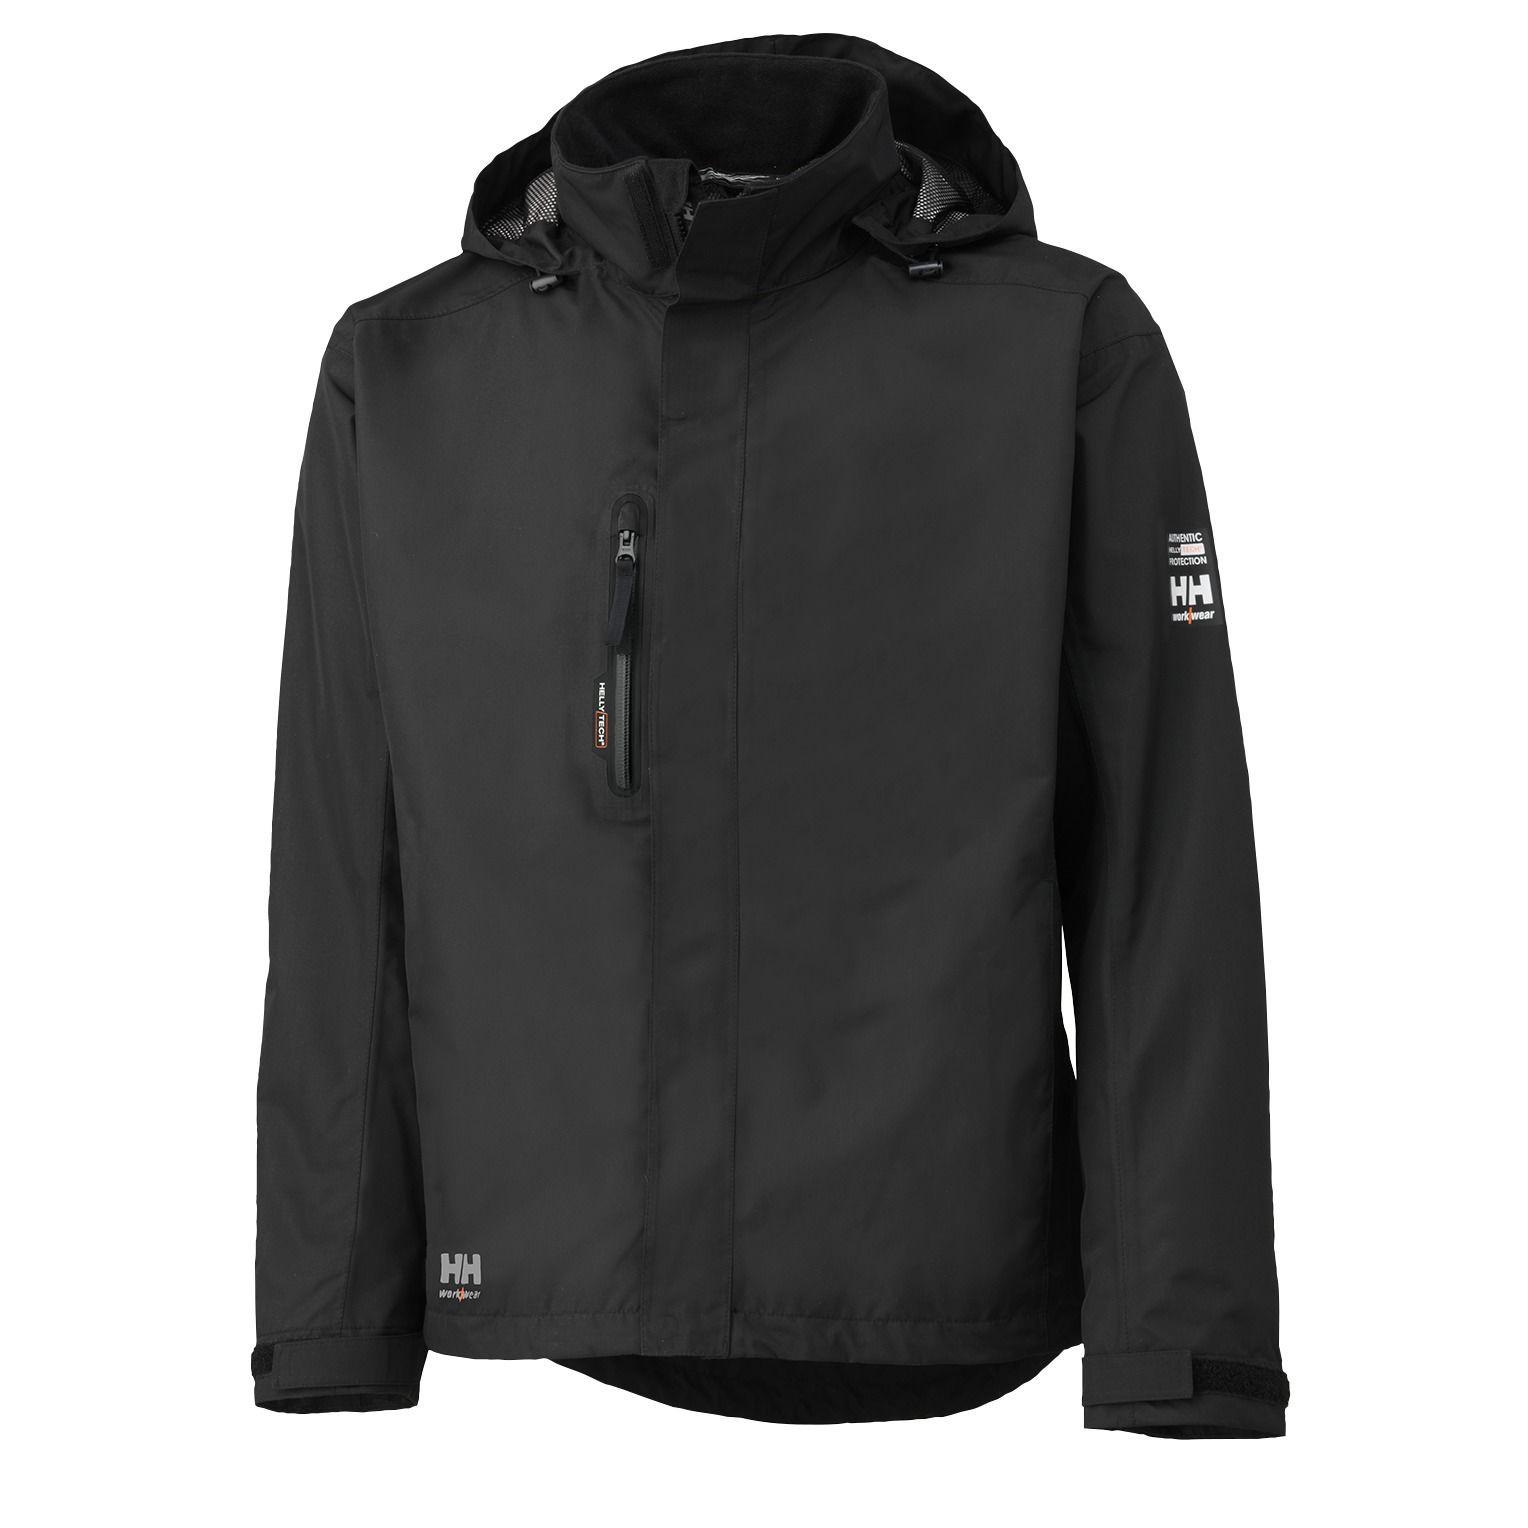 Куртка Helly Hansen Haag Jacket - 71043 (Black; L)